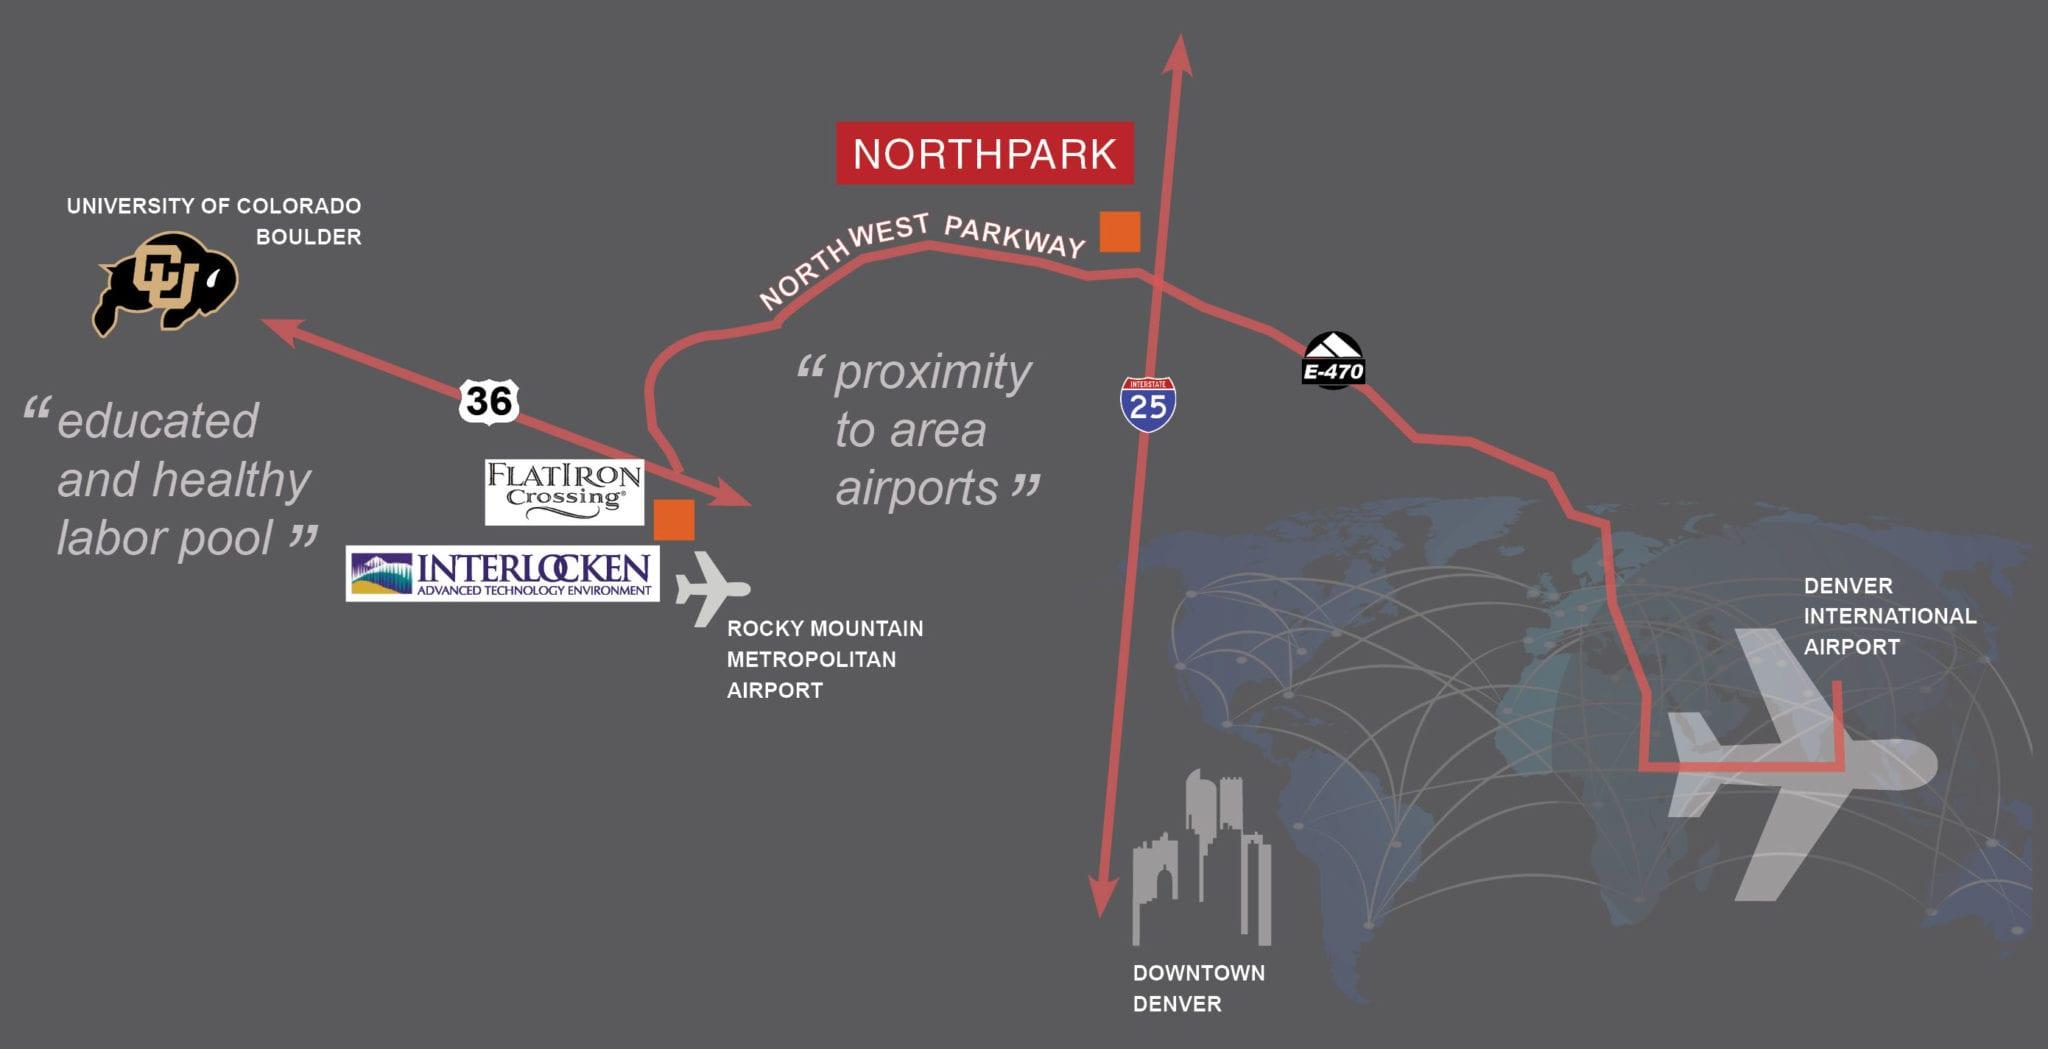 newmark northpark chart